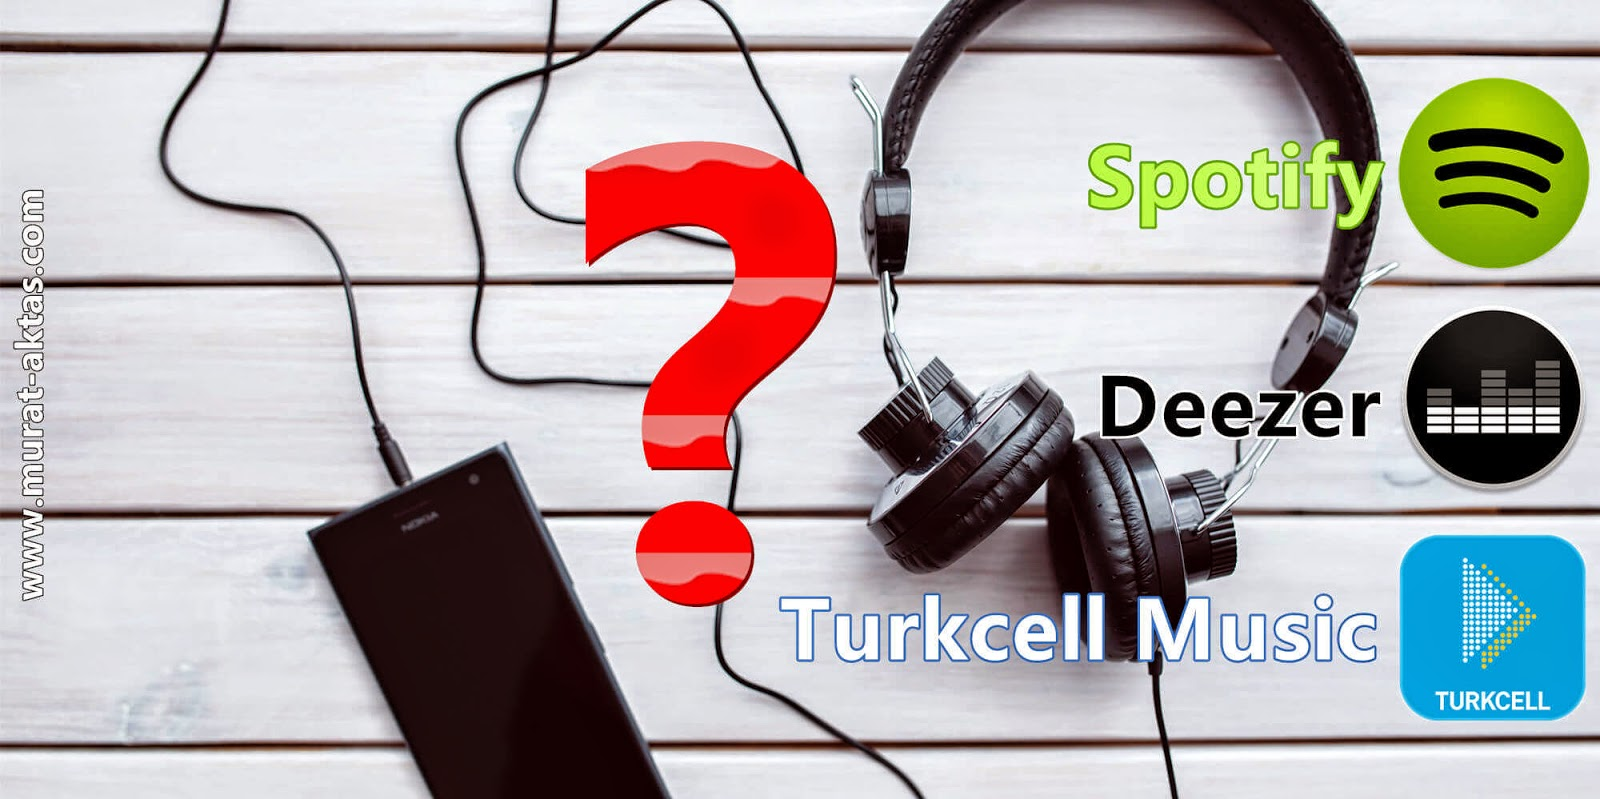 Spotify, Deezer & Turkcell Müzik: Hangisini Tercih Etmeli? - www.murat-aktas.com